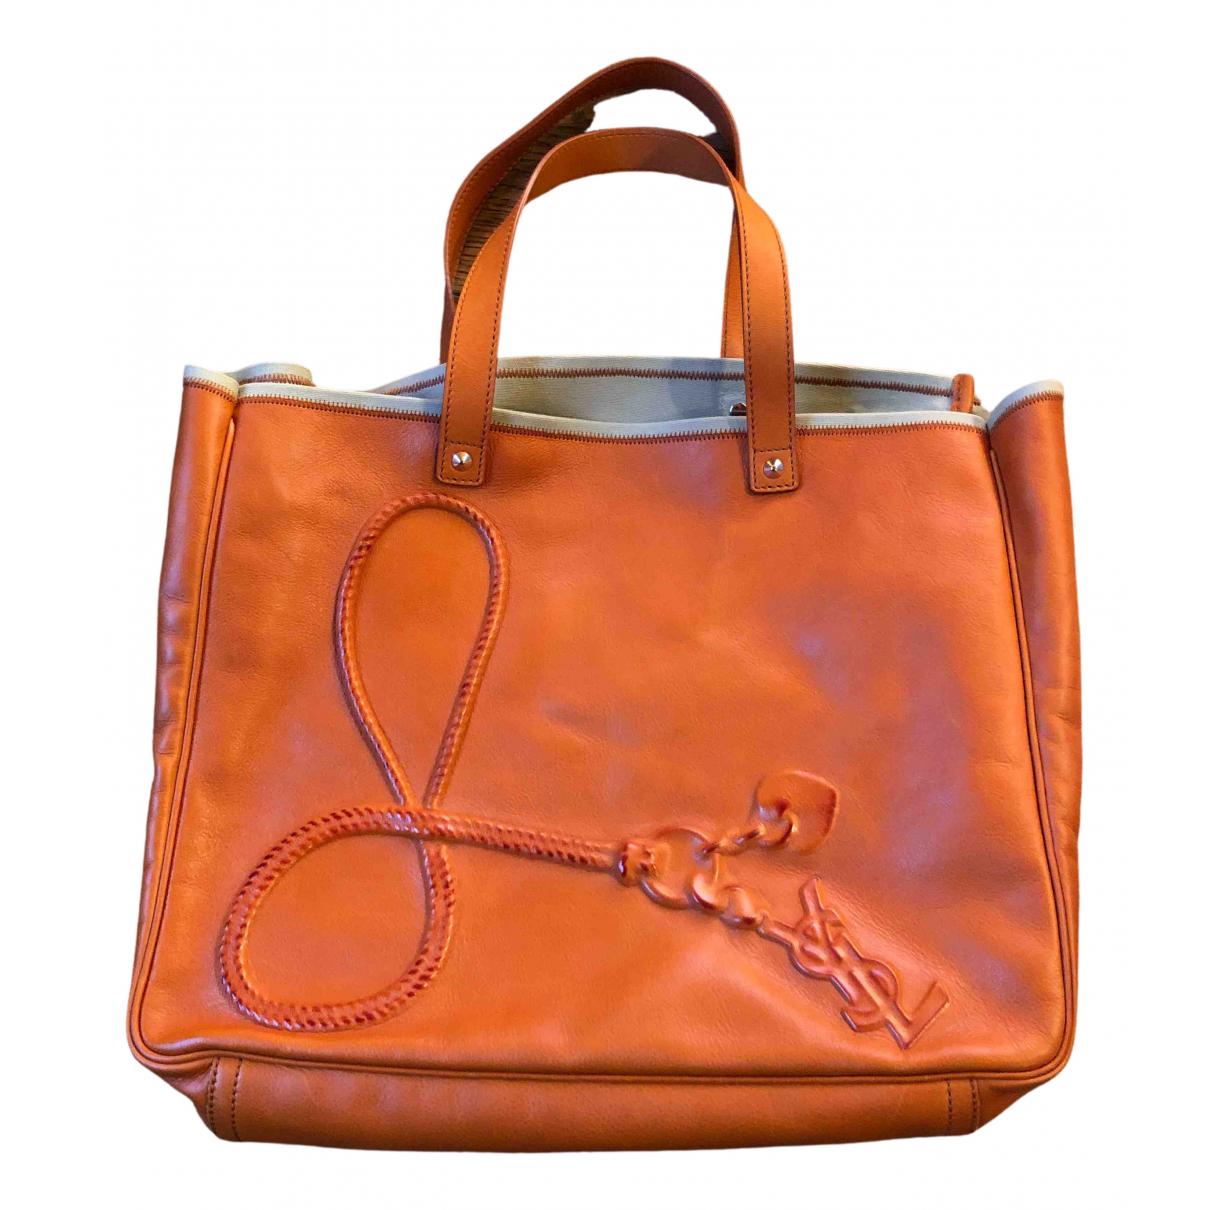 Yves Saint Laurent \N Handtasche in  Orange Leder